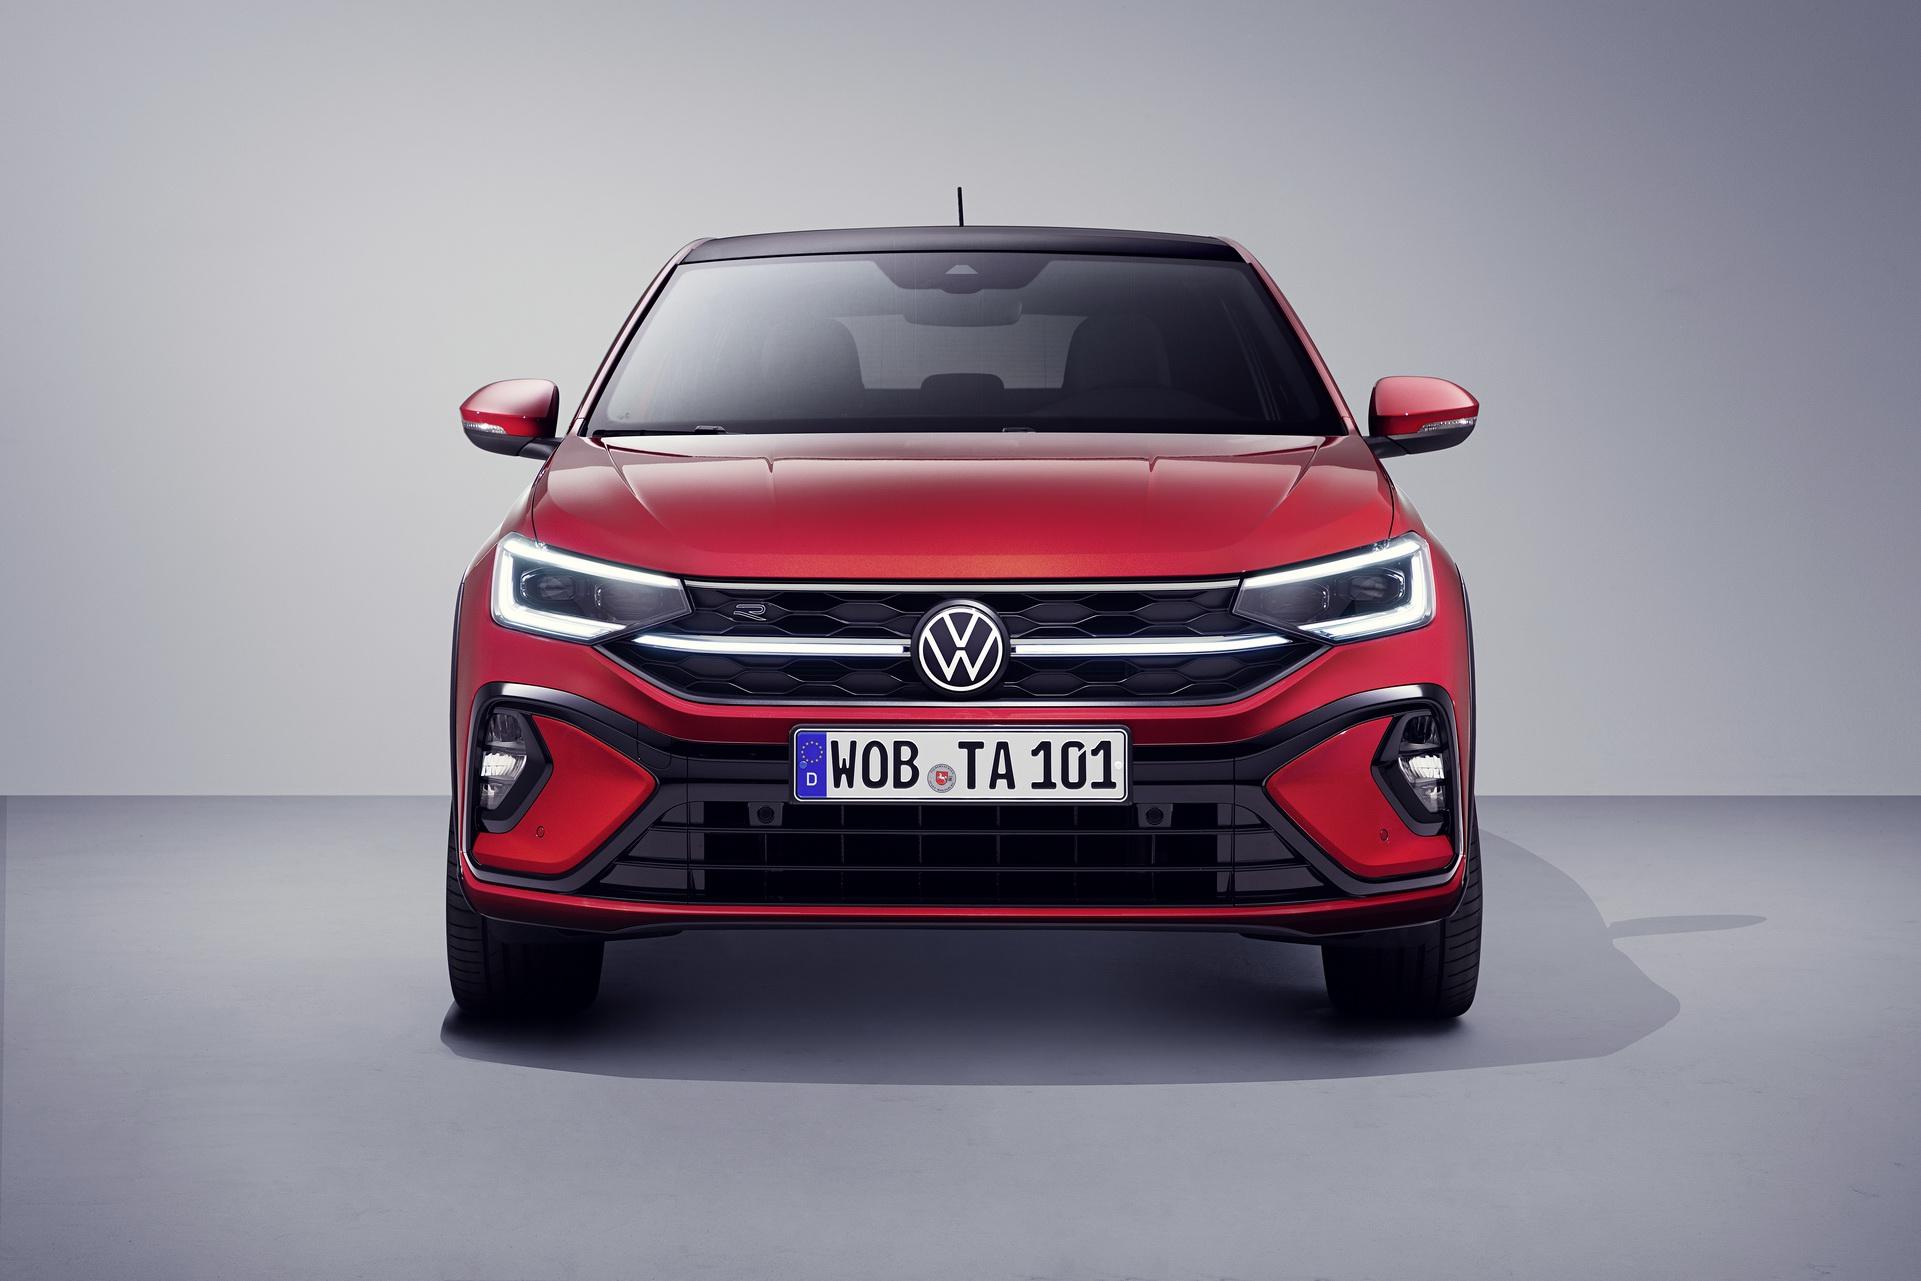 VW Taigo: Αυτό είναι το νέο μικρό και στιλάτο SUV της Volkswagen